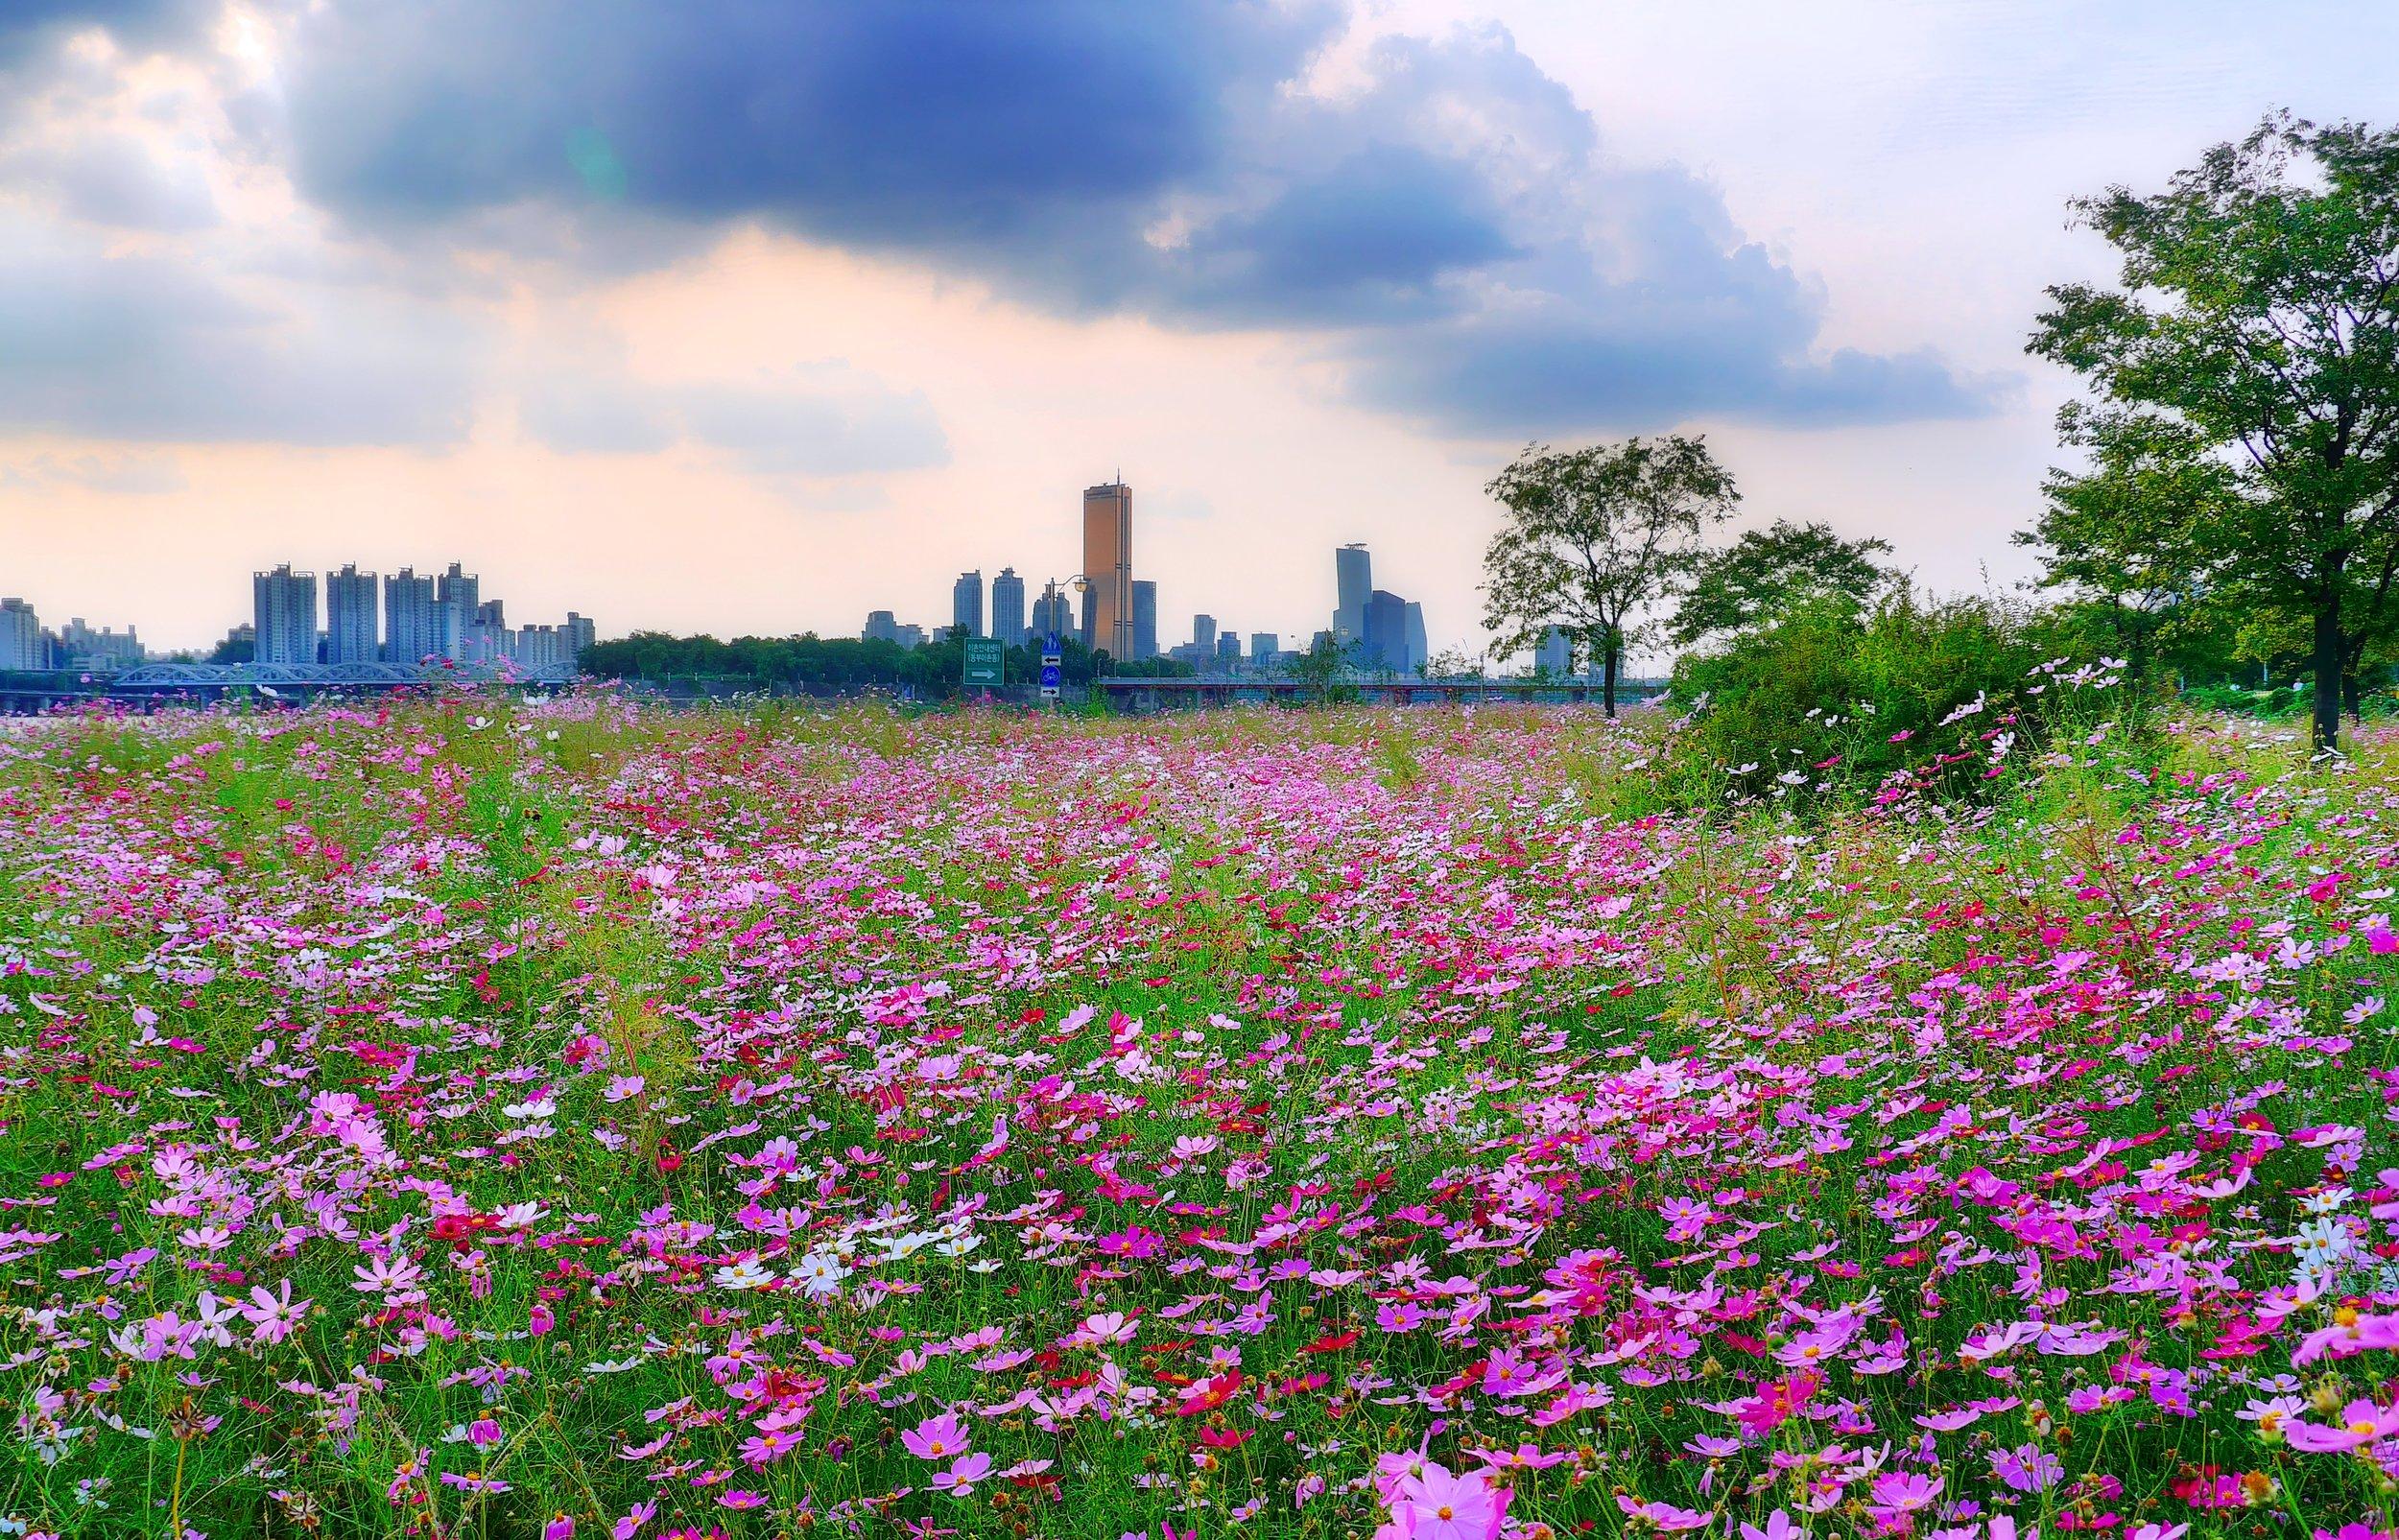 ICHON HANGANG PARK - Image credit: travel oriented